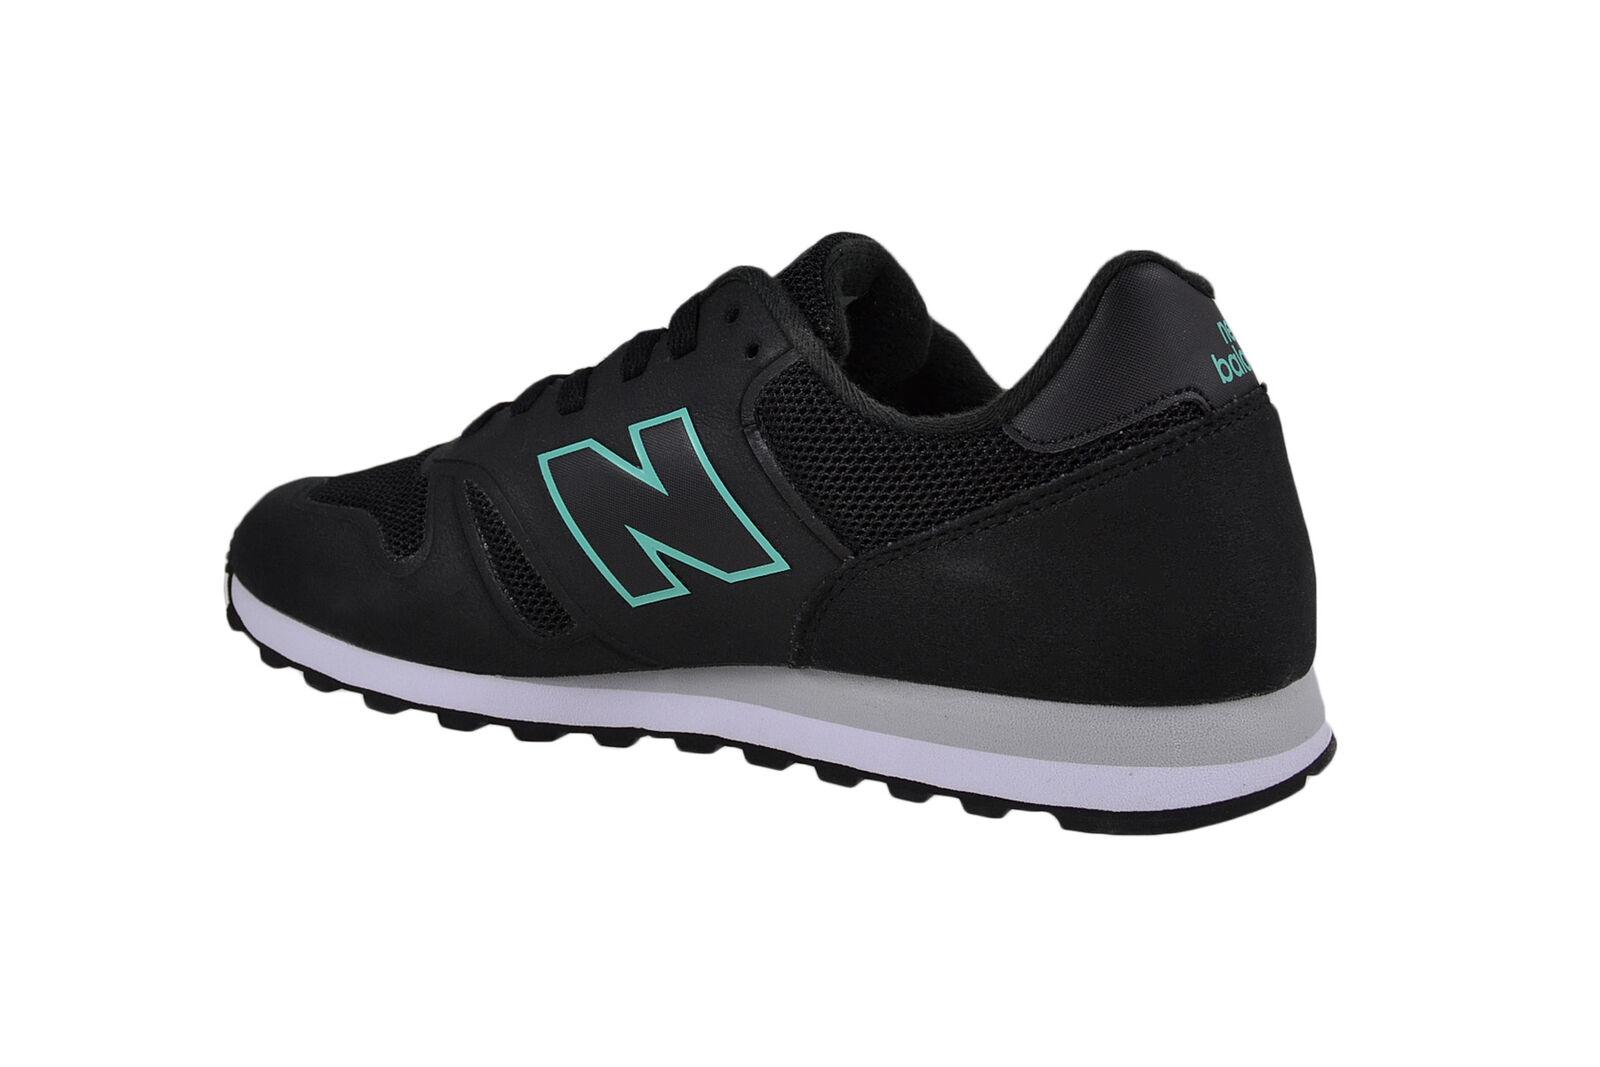 New Balance MD373 BM black Schuhe/Sneaker